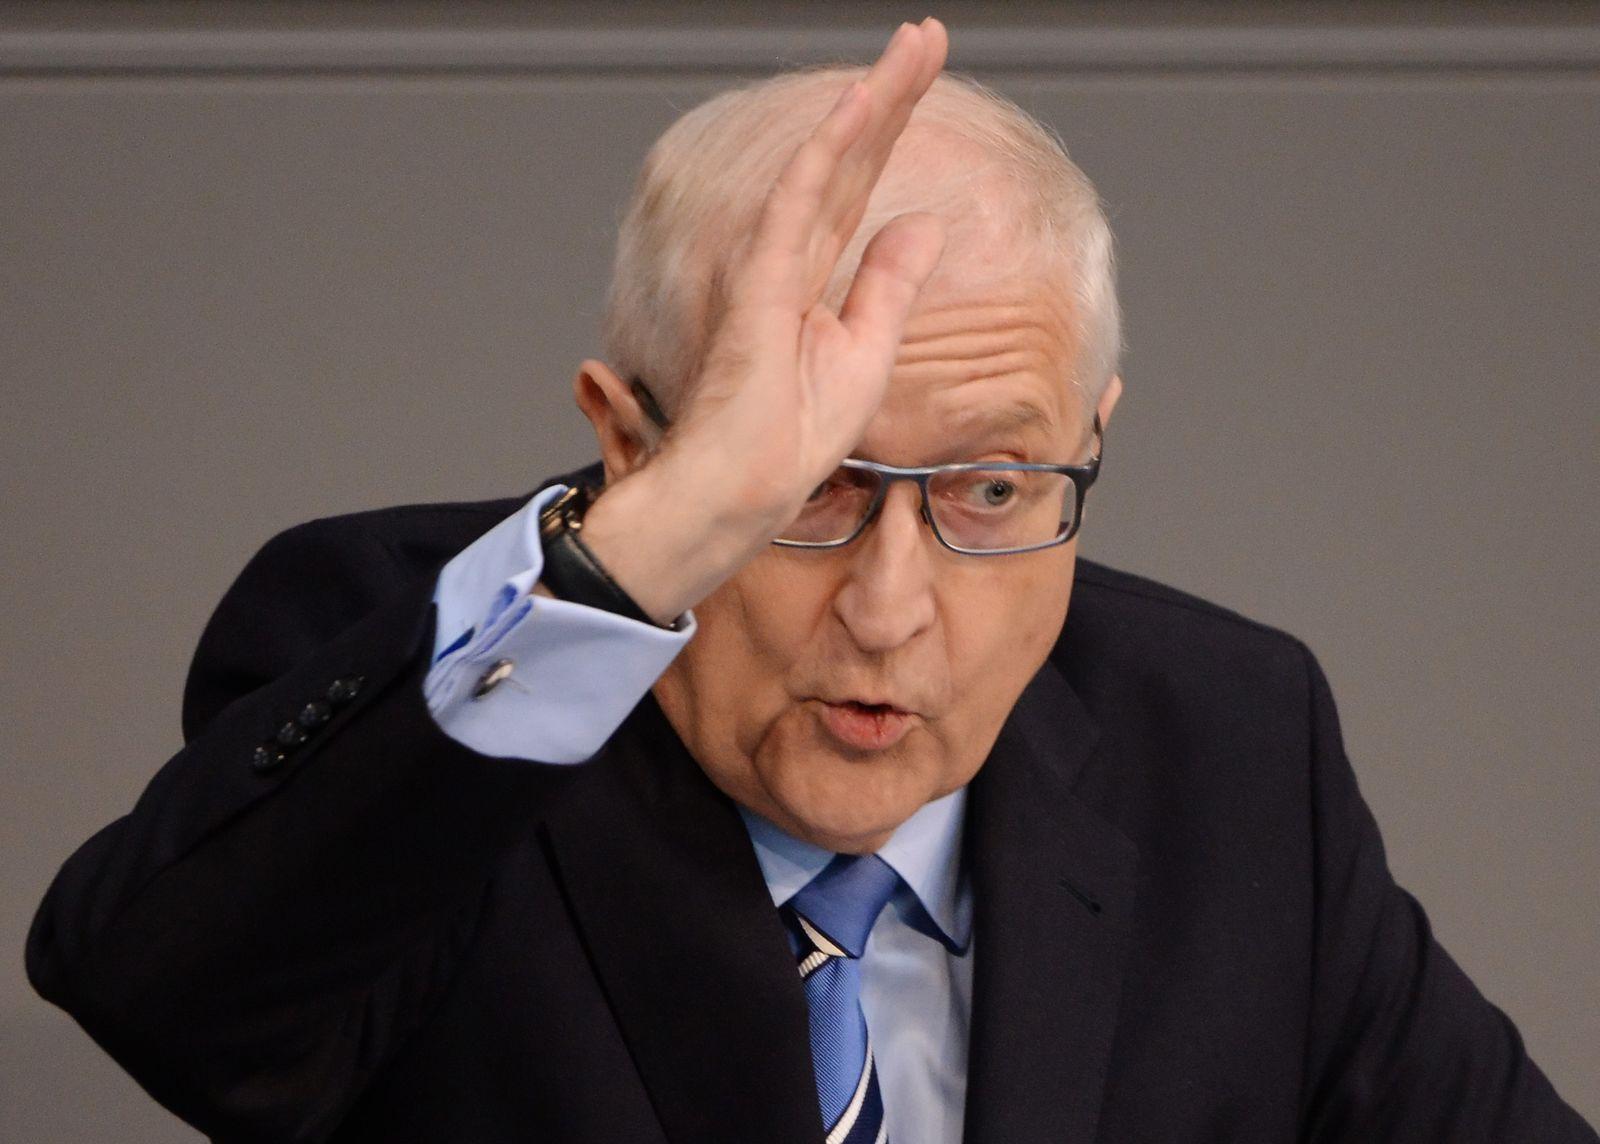 Bundestag Rainer Brüderle